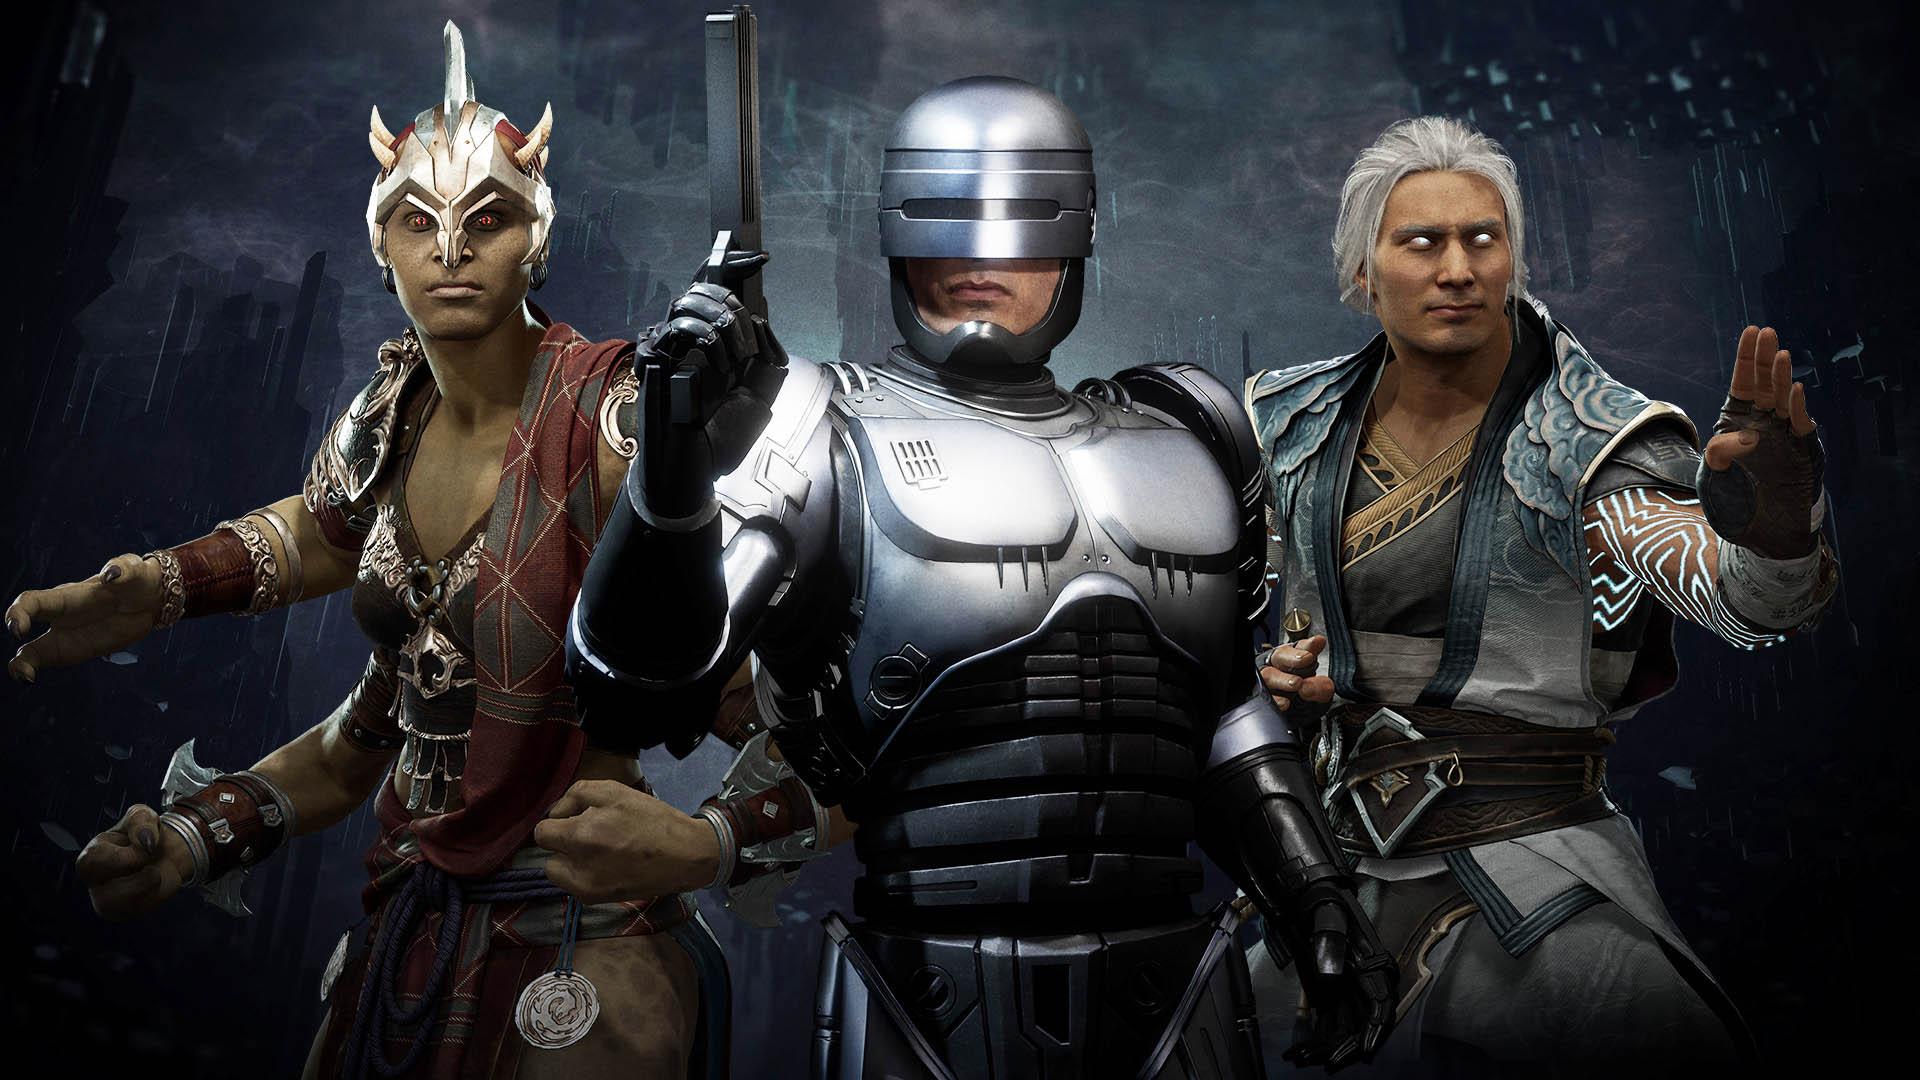 Mortal Kombat 11 Aftermath muestra un brutal tráiler gameplay con ...